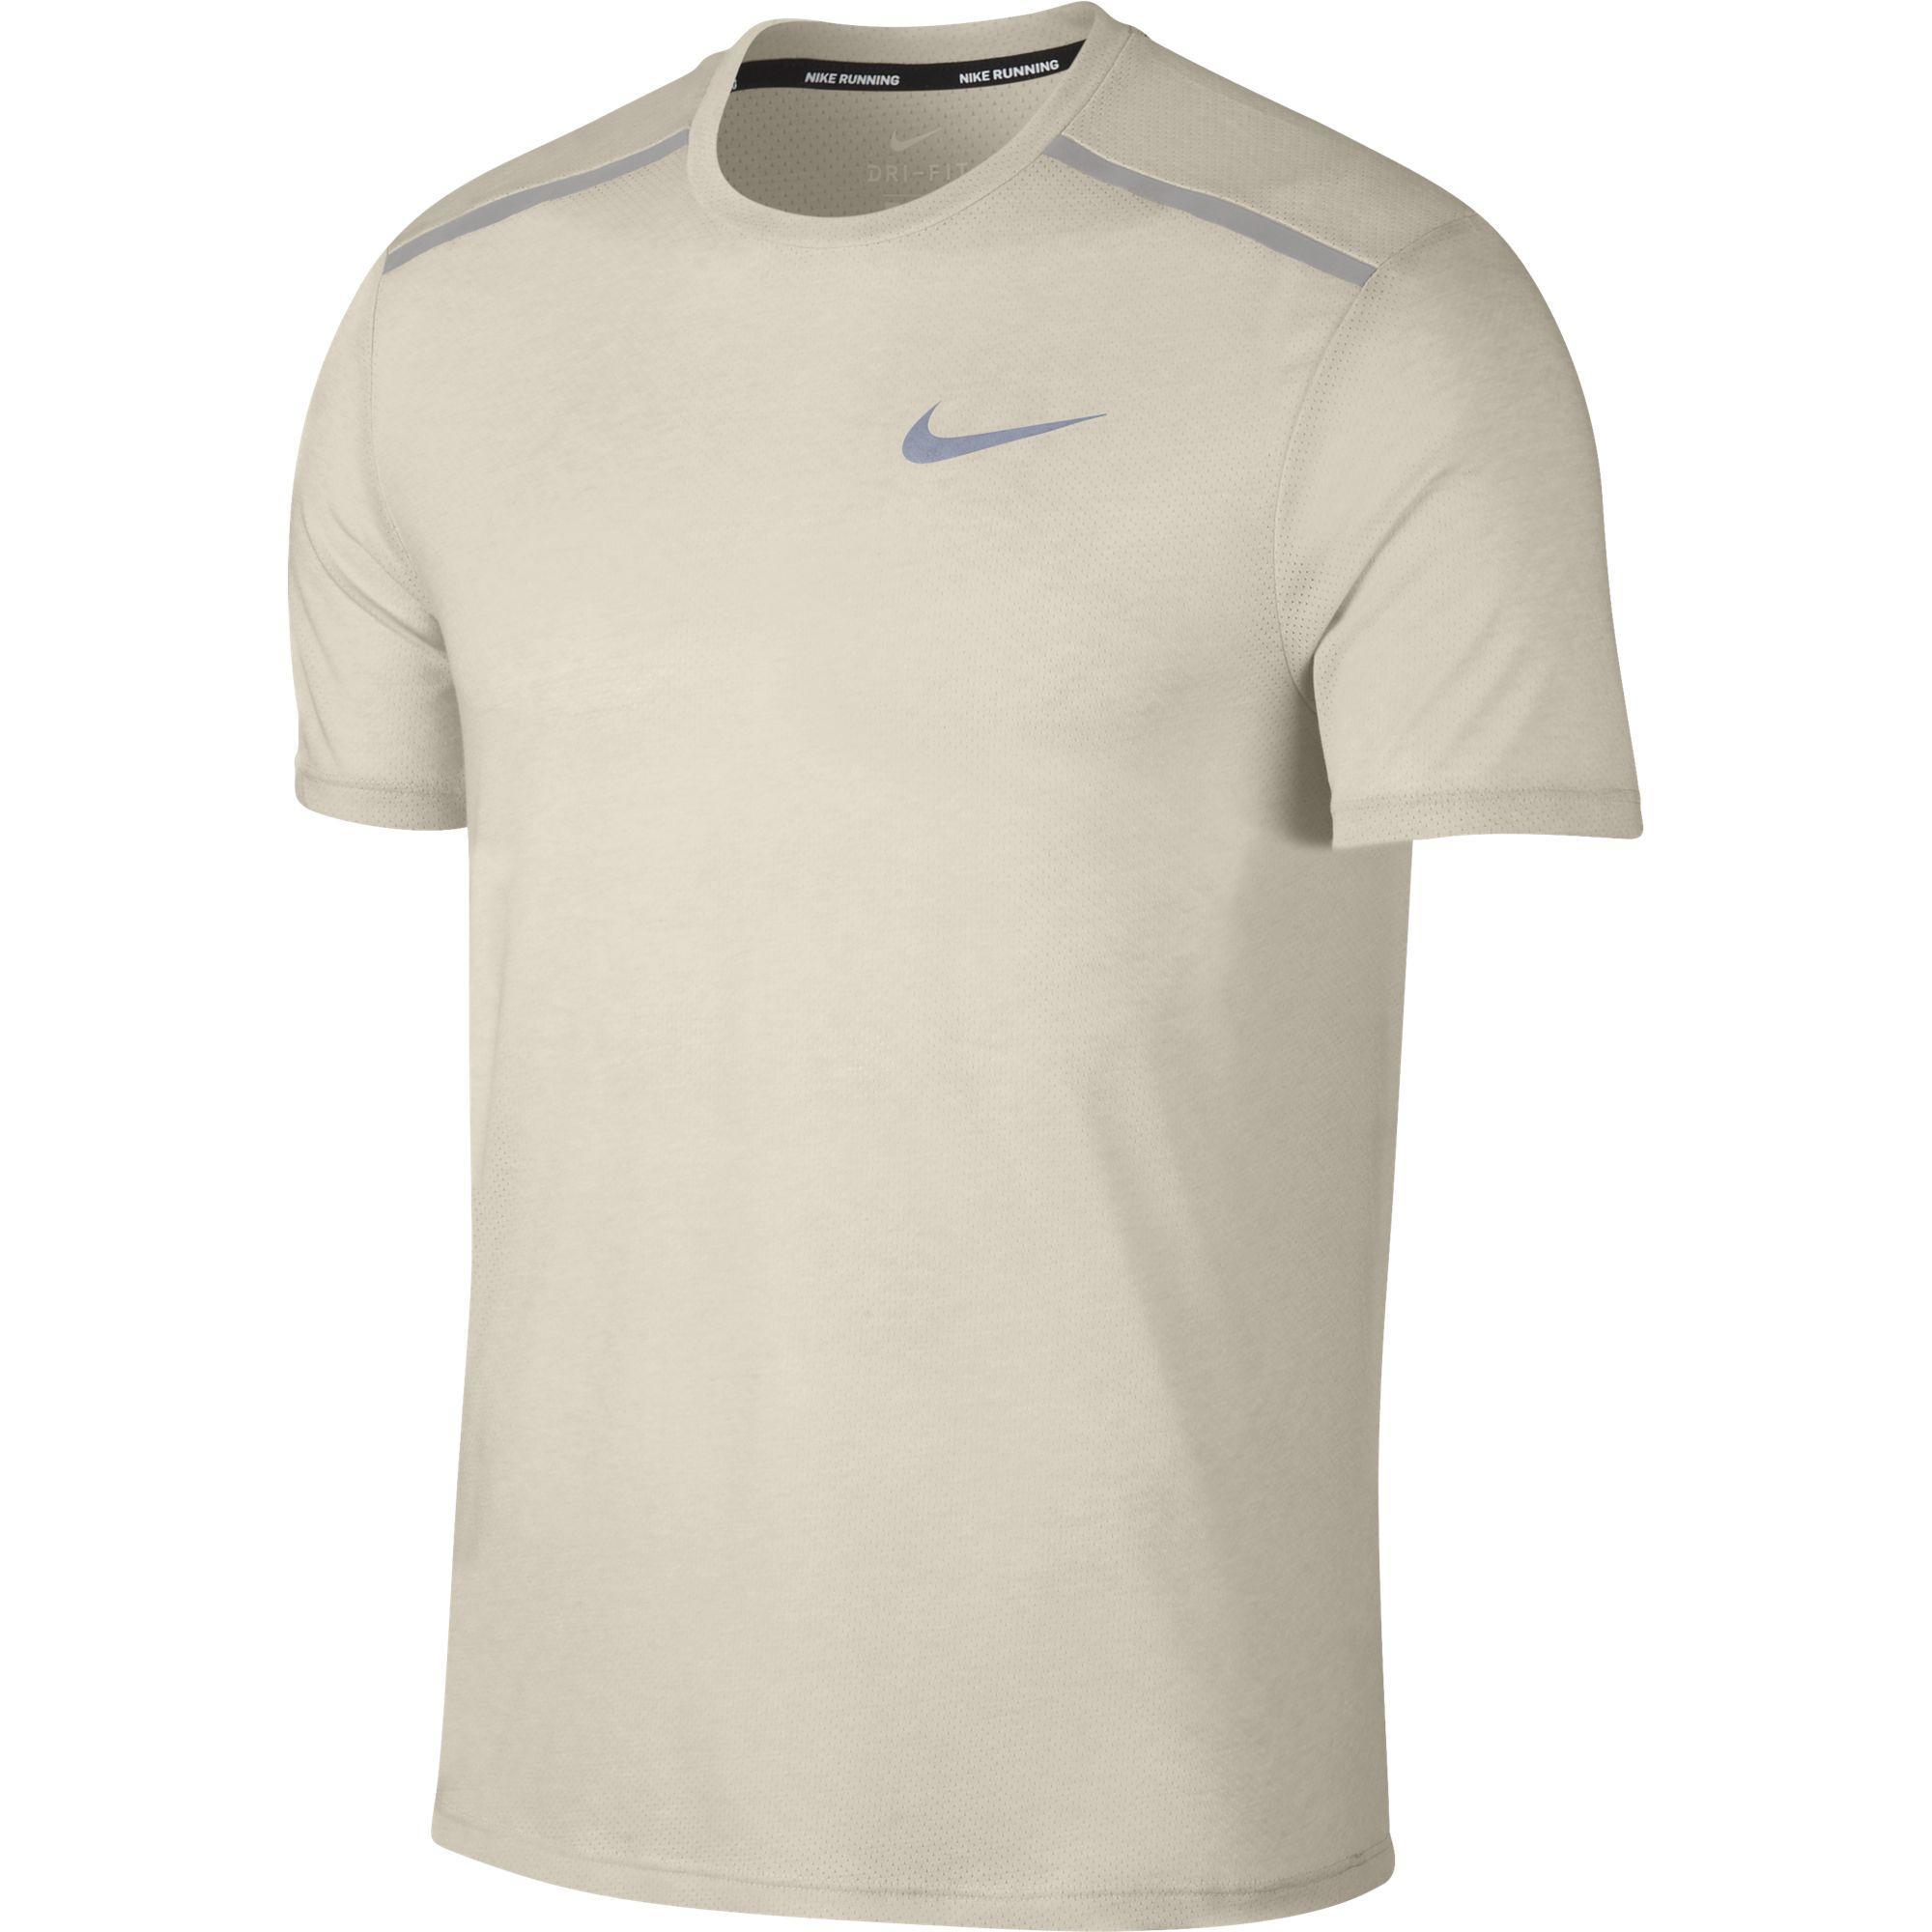 Nike T-shirt Breathe Rise 365